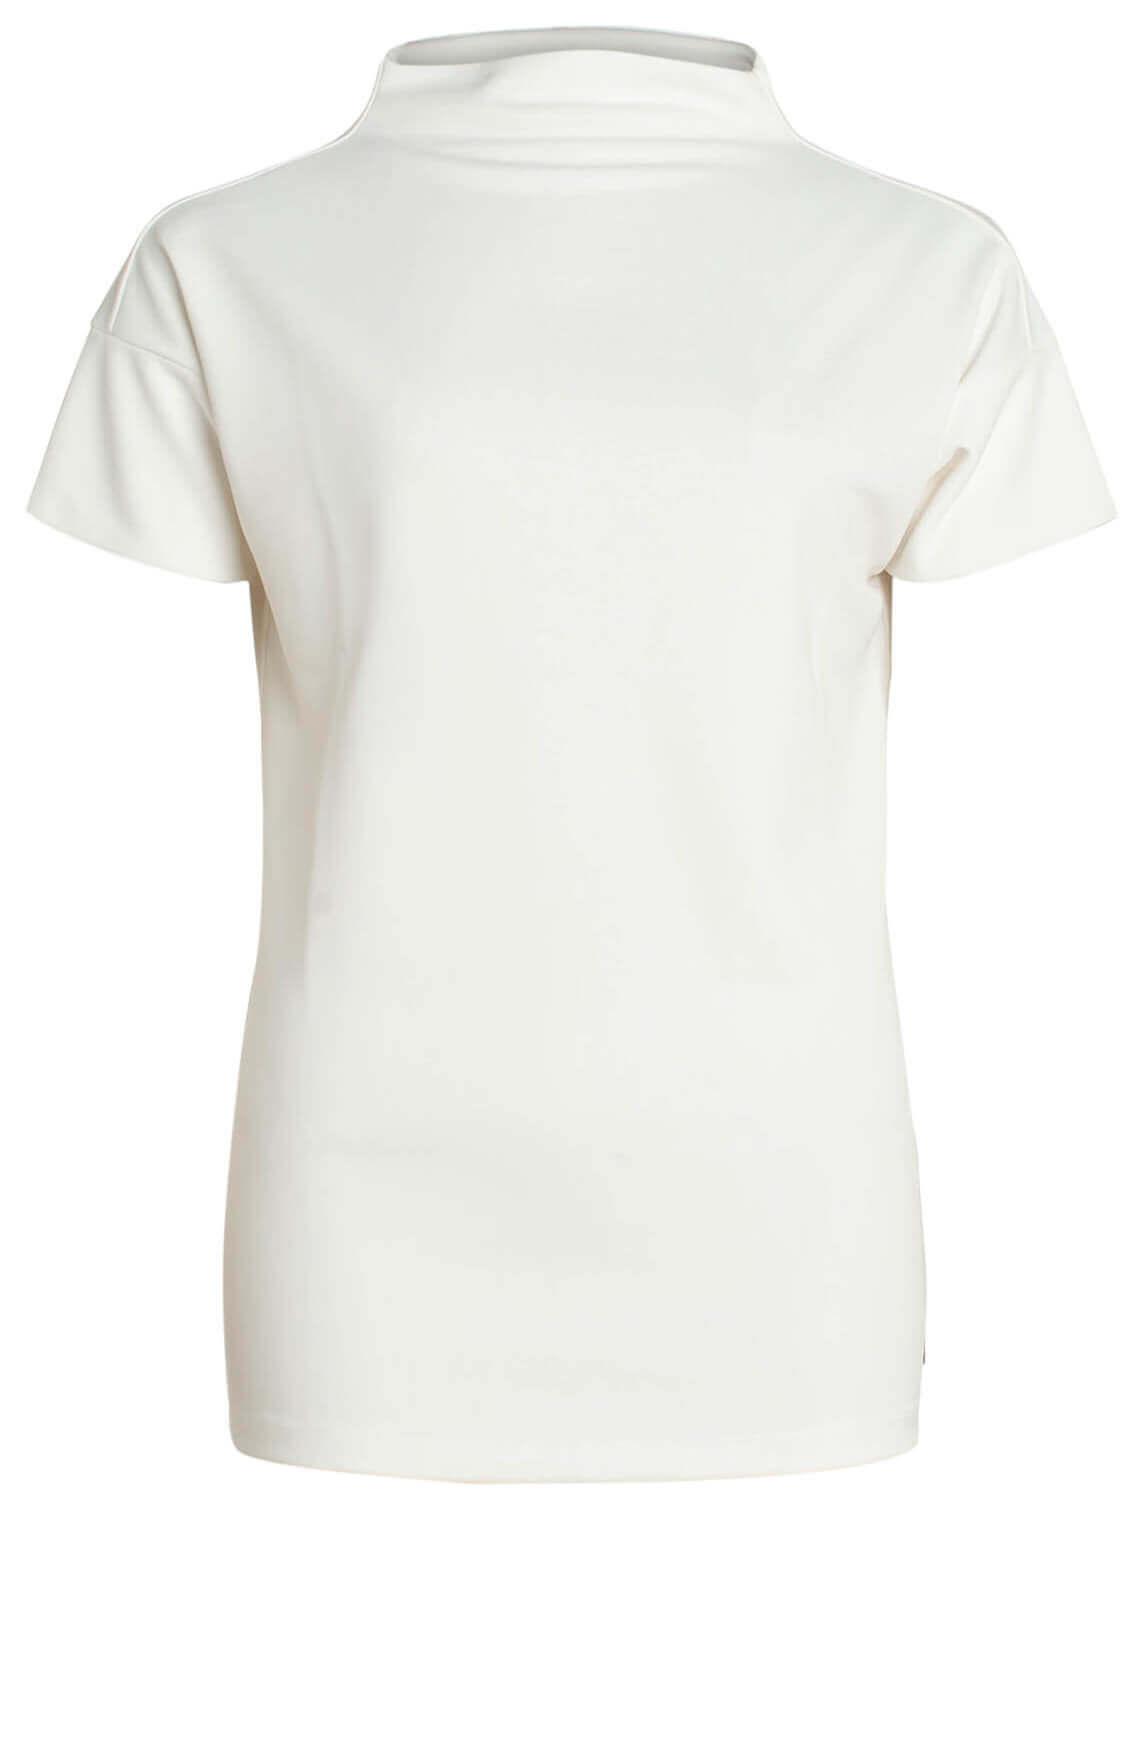 Anna Dames Shirt met hoge kraag wit